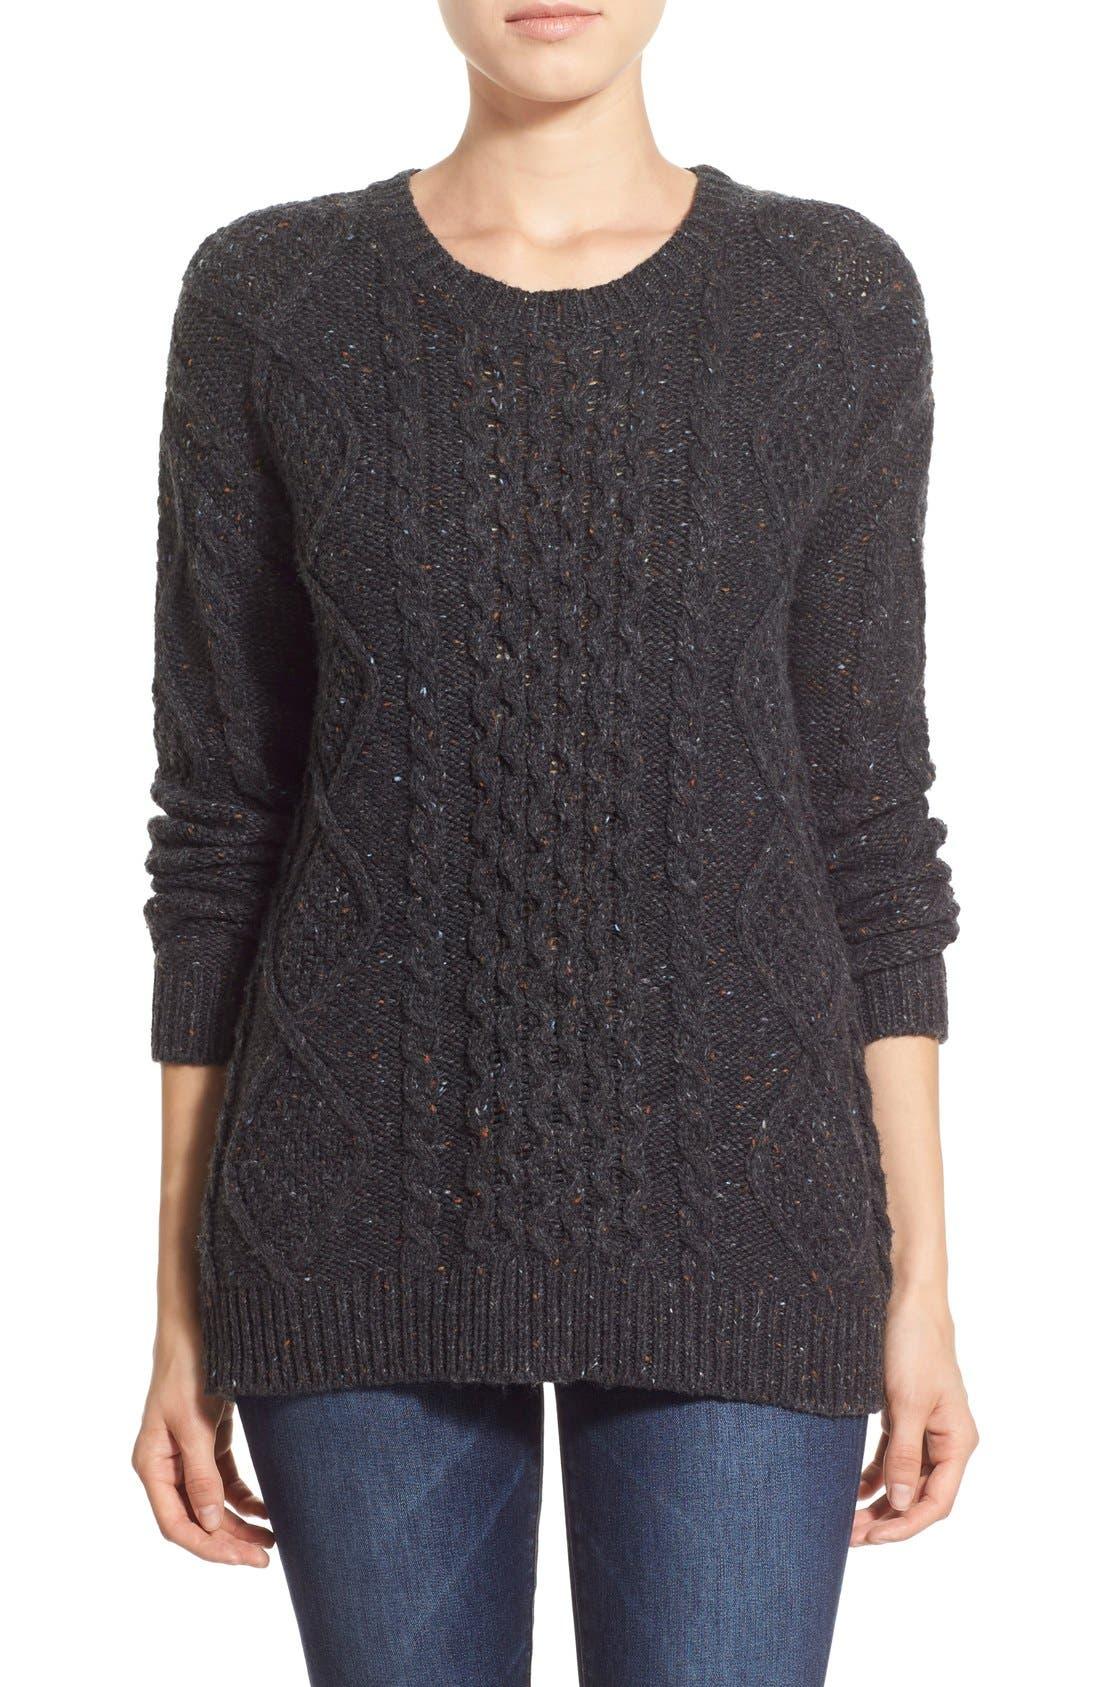 Treasure&Bond Cable Knit Sweater,                         Main,                         color, 020